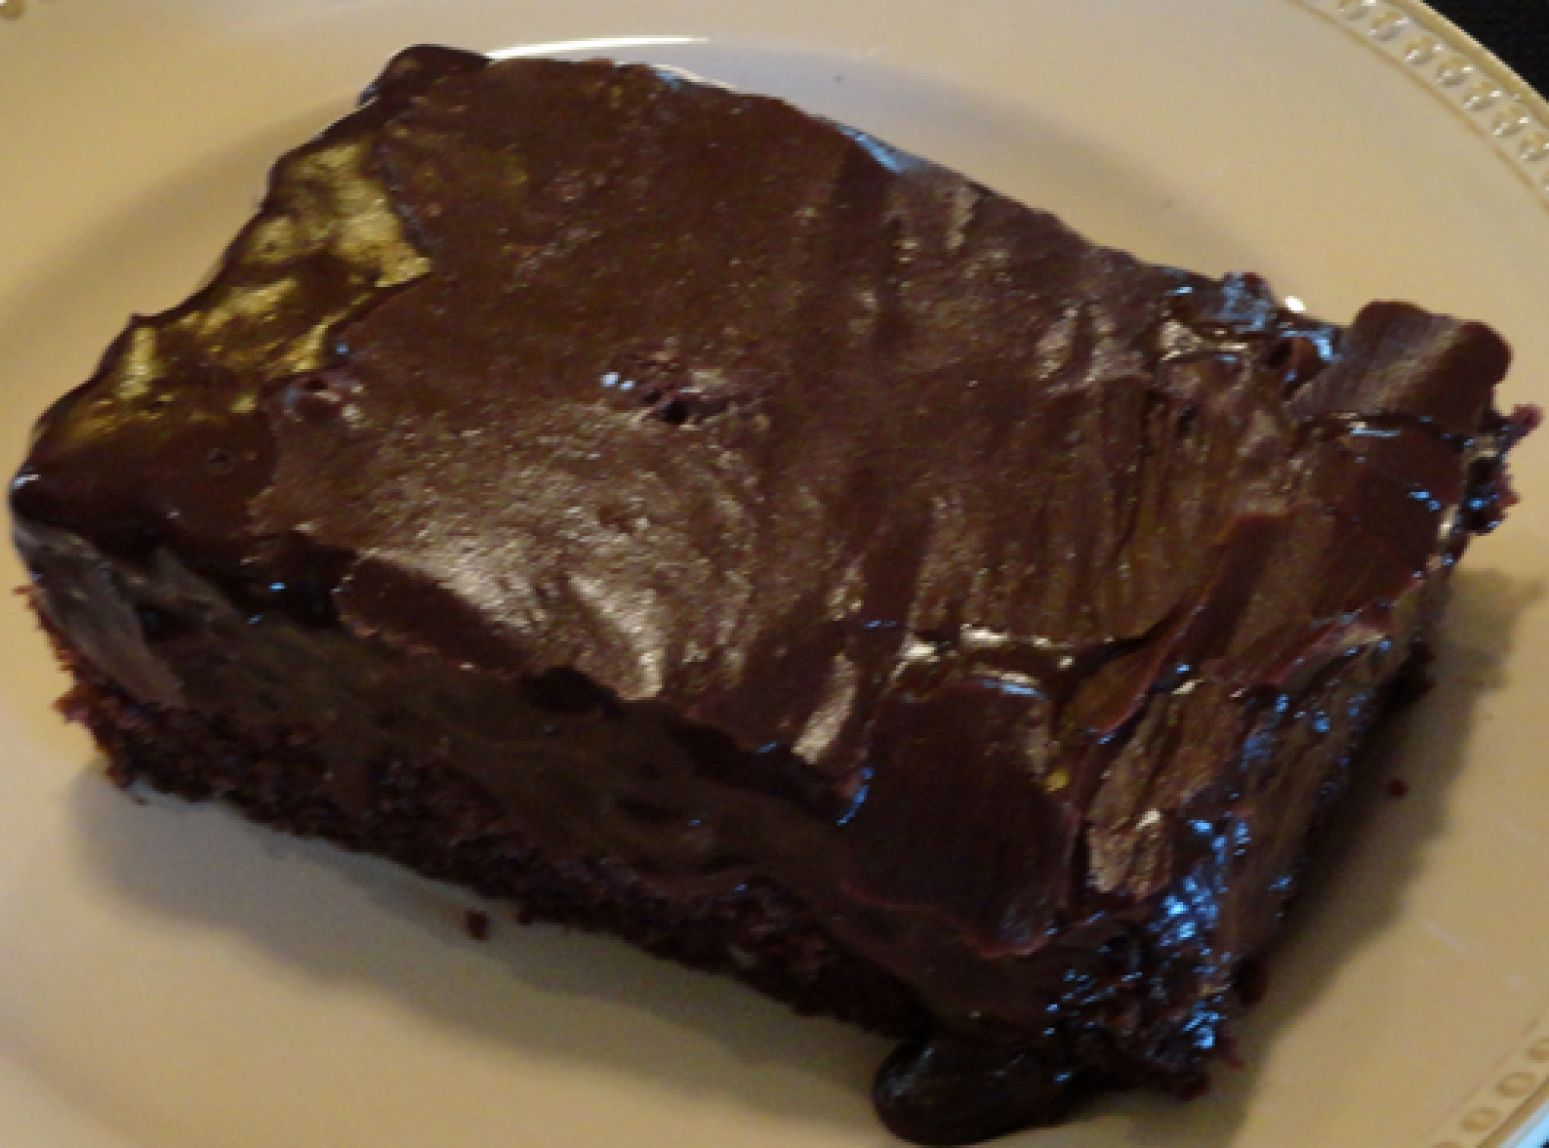 Mom's Chocolate Decadent Cake